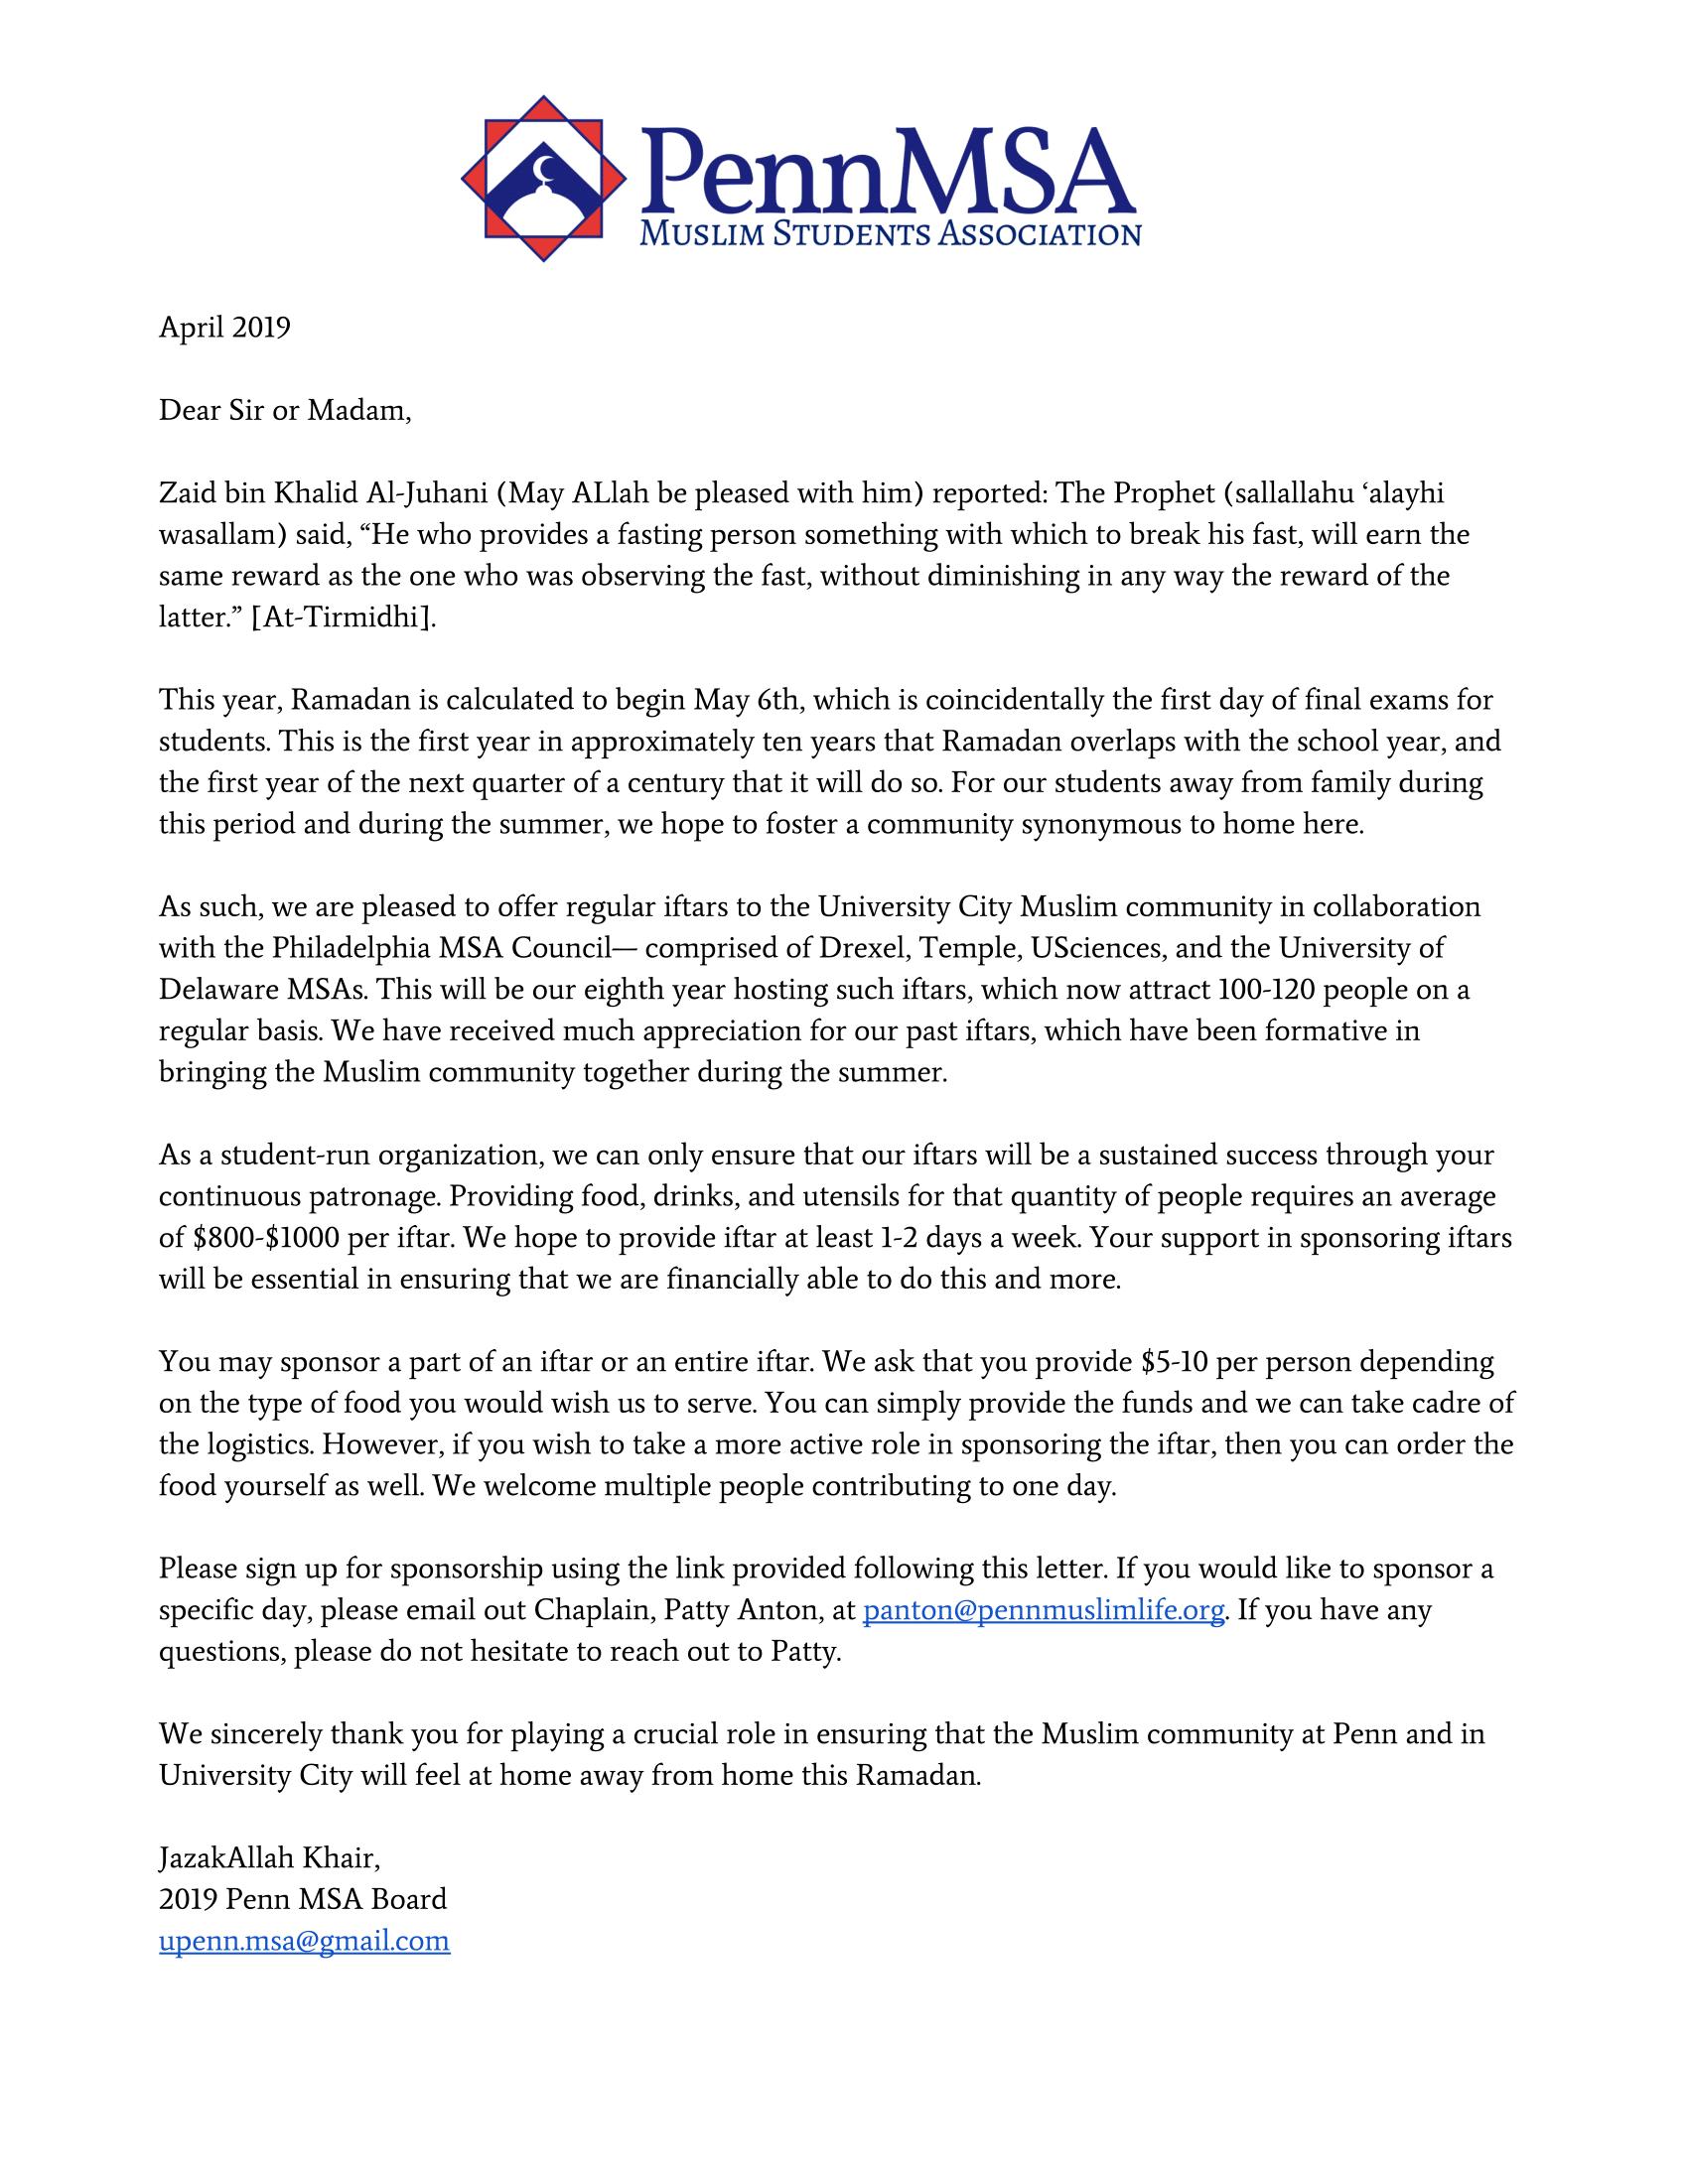 Ramadan 2019 Iftar Sponsorship Letter-1.png